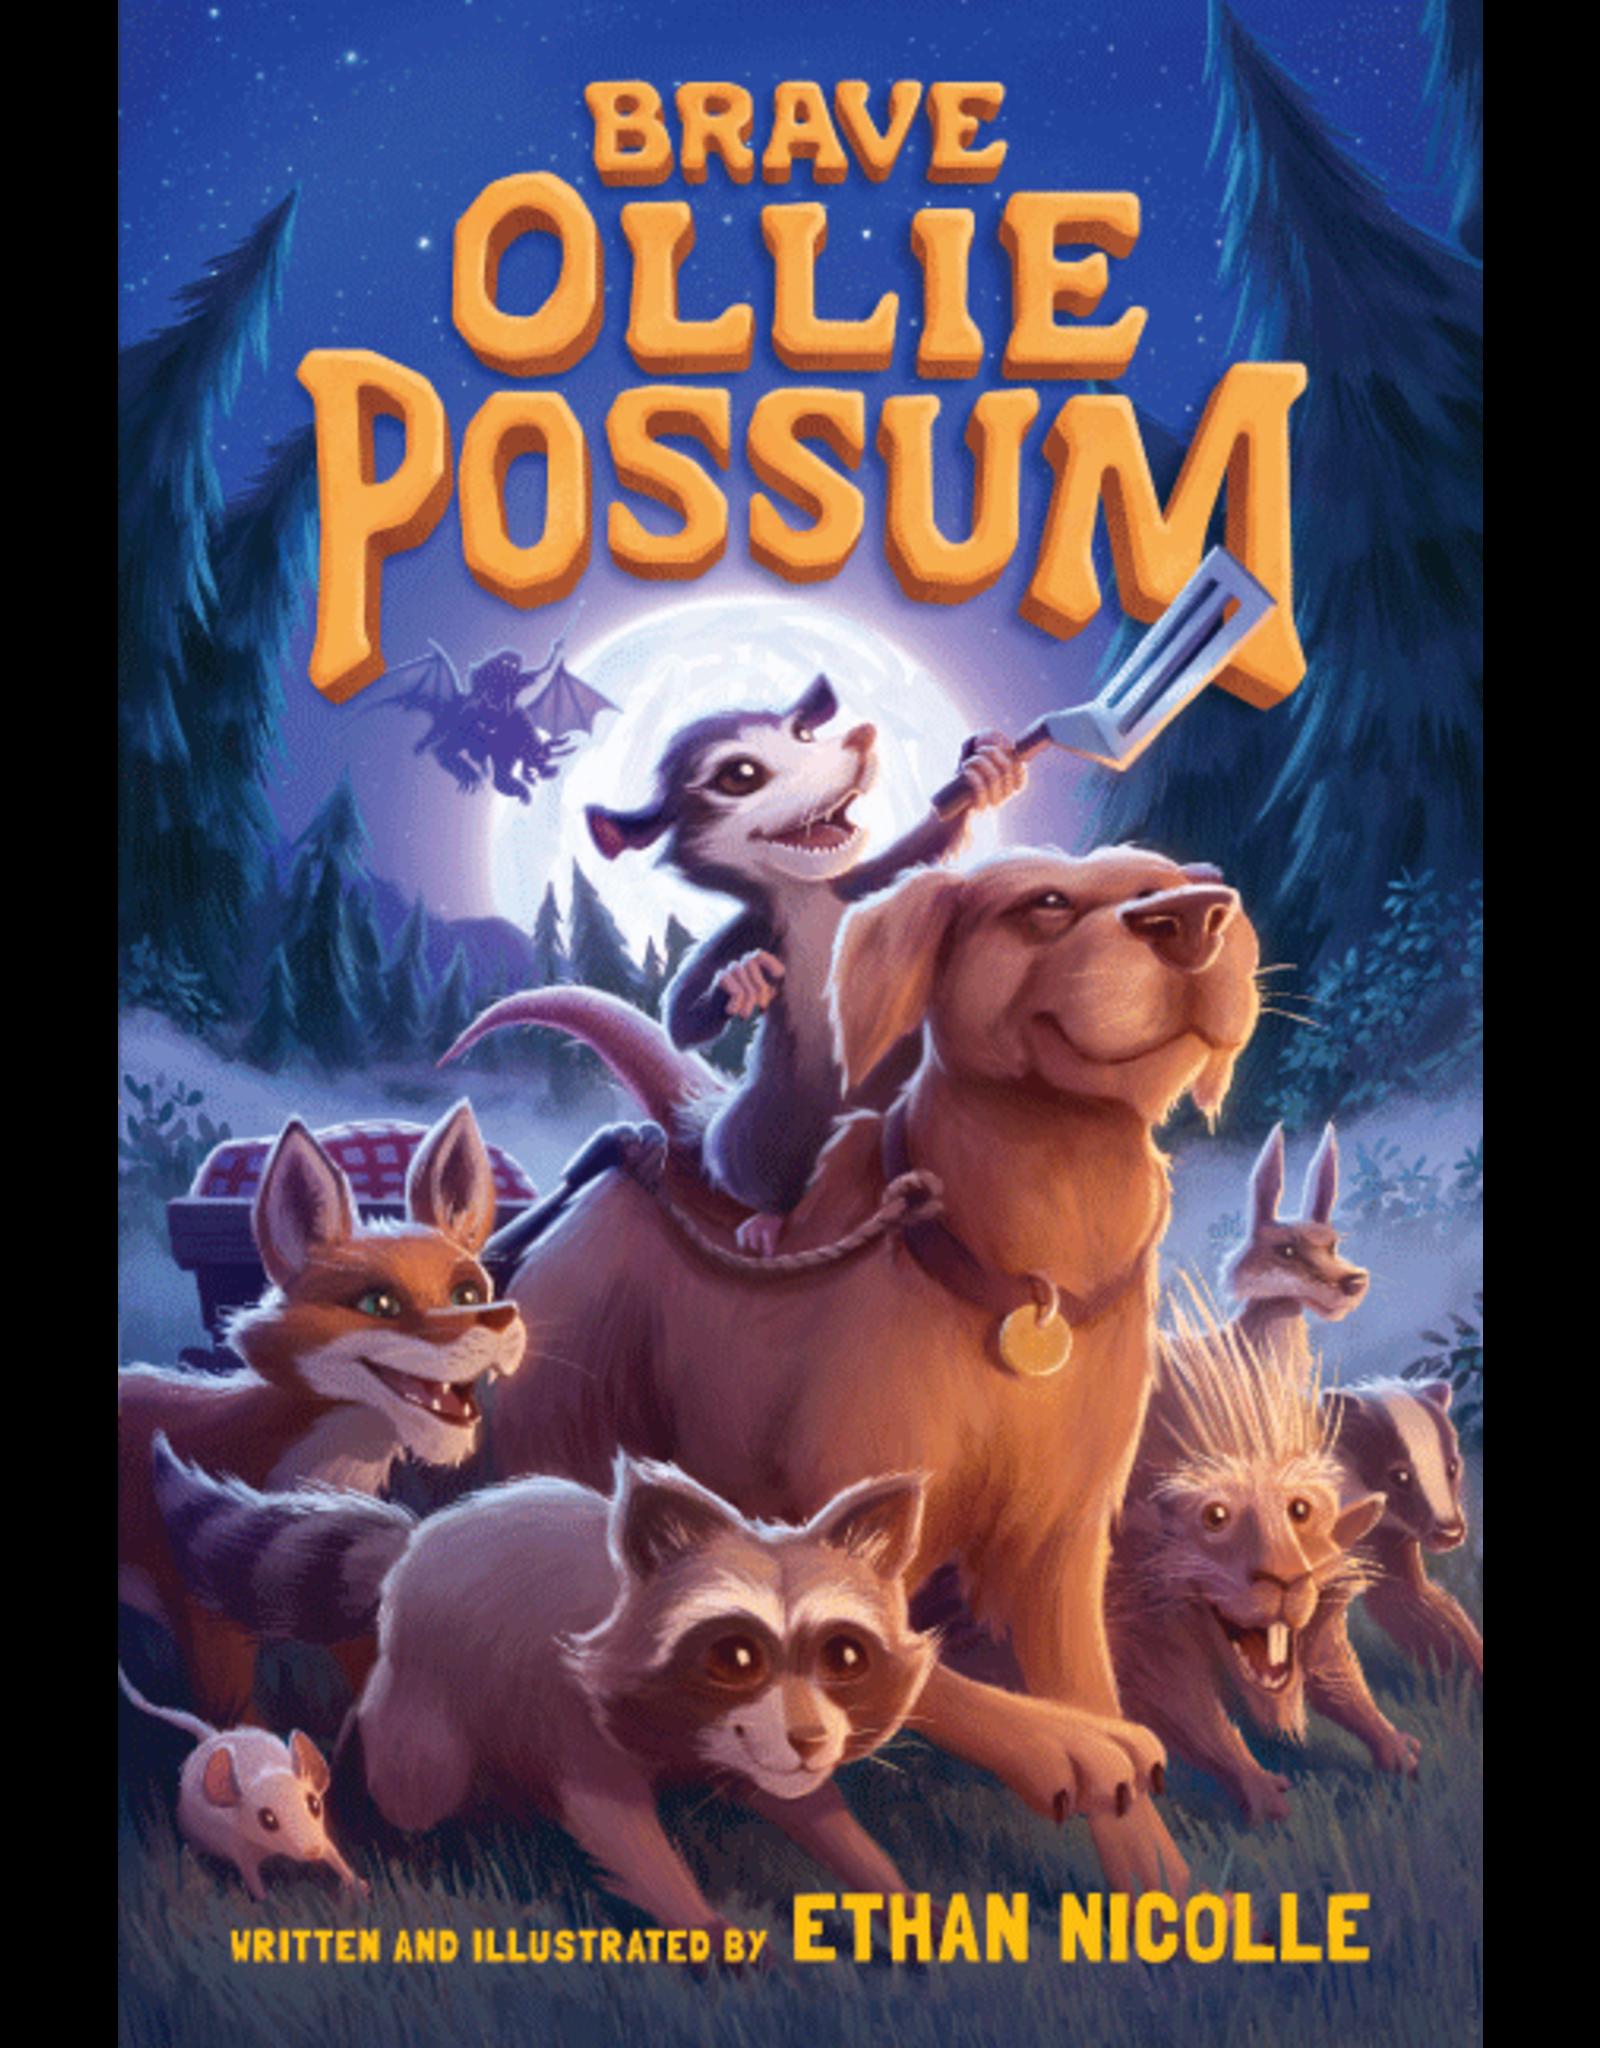 Brave Ollie Possum, Hardback (ETHAN NICOLLE)